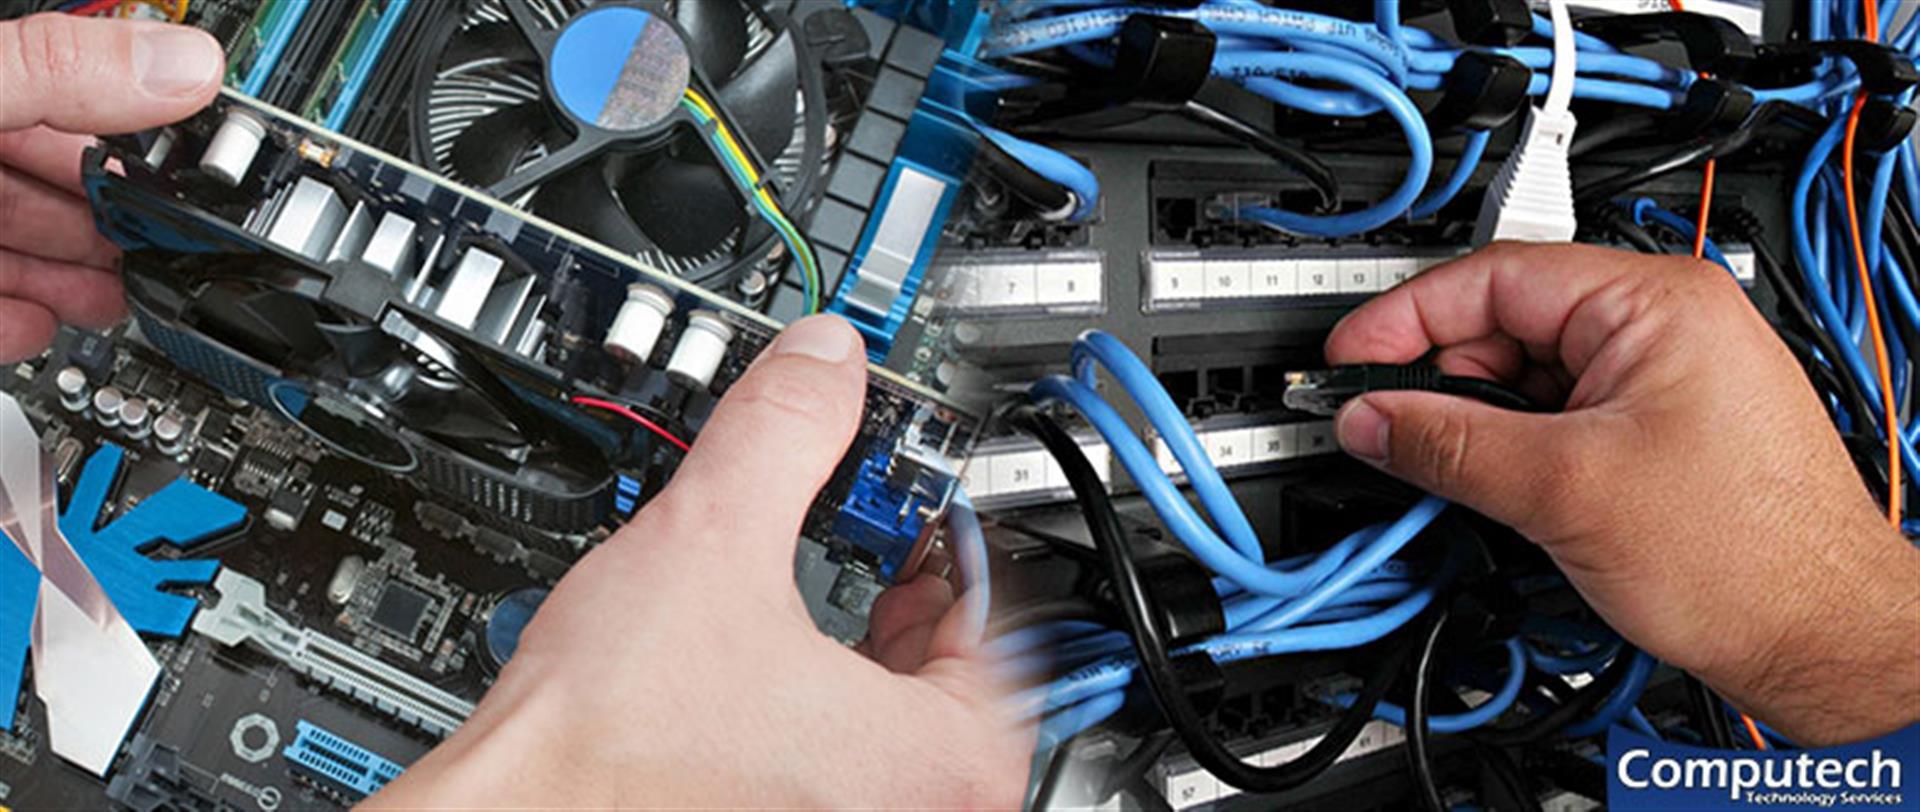 Talladega Alabama Onsite Computer & Printer Repair, Network, Voice & Data Low Voltage Cabling Services